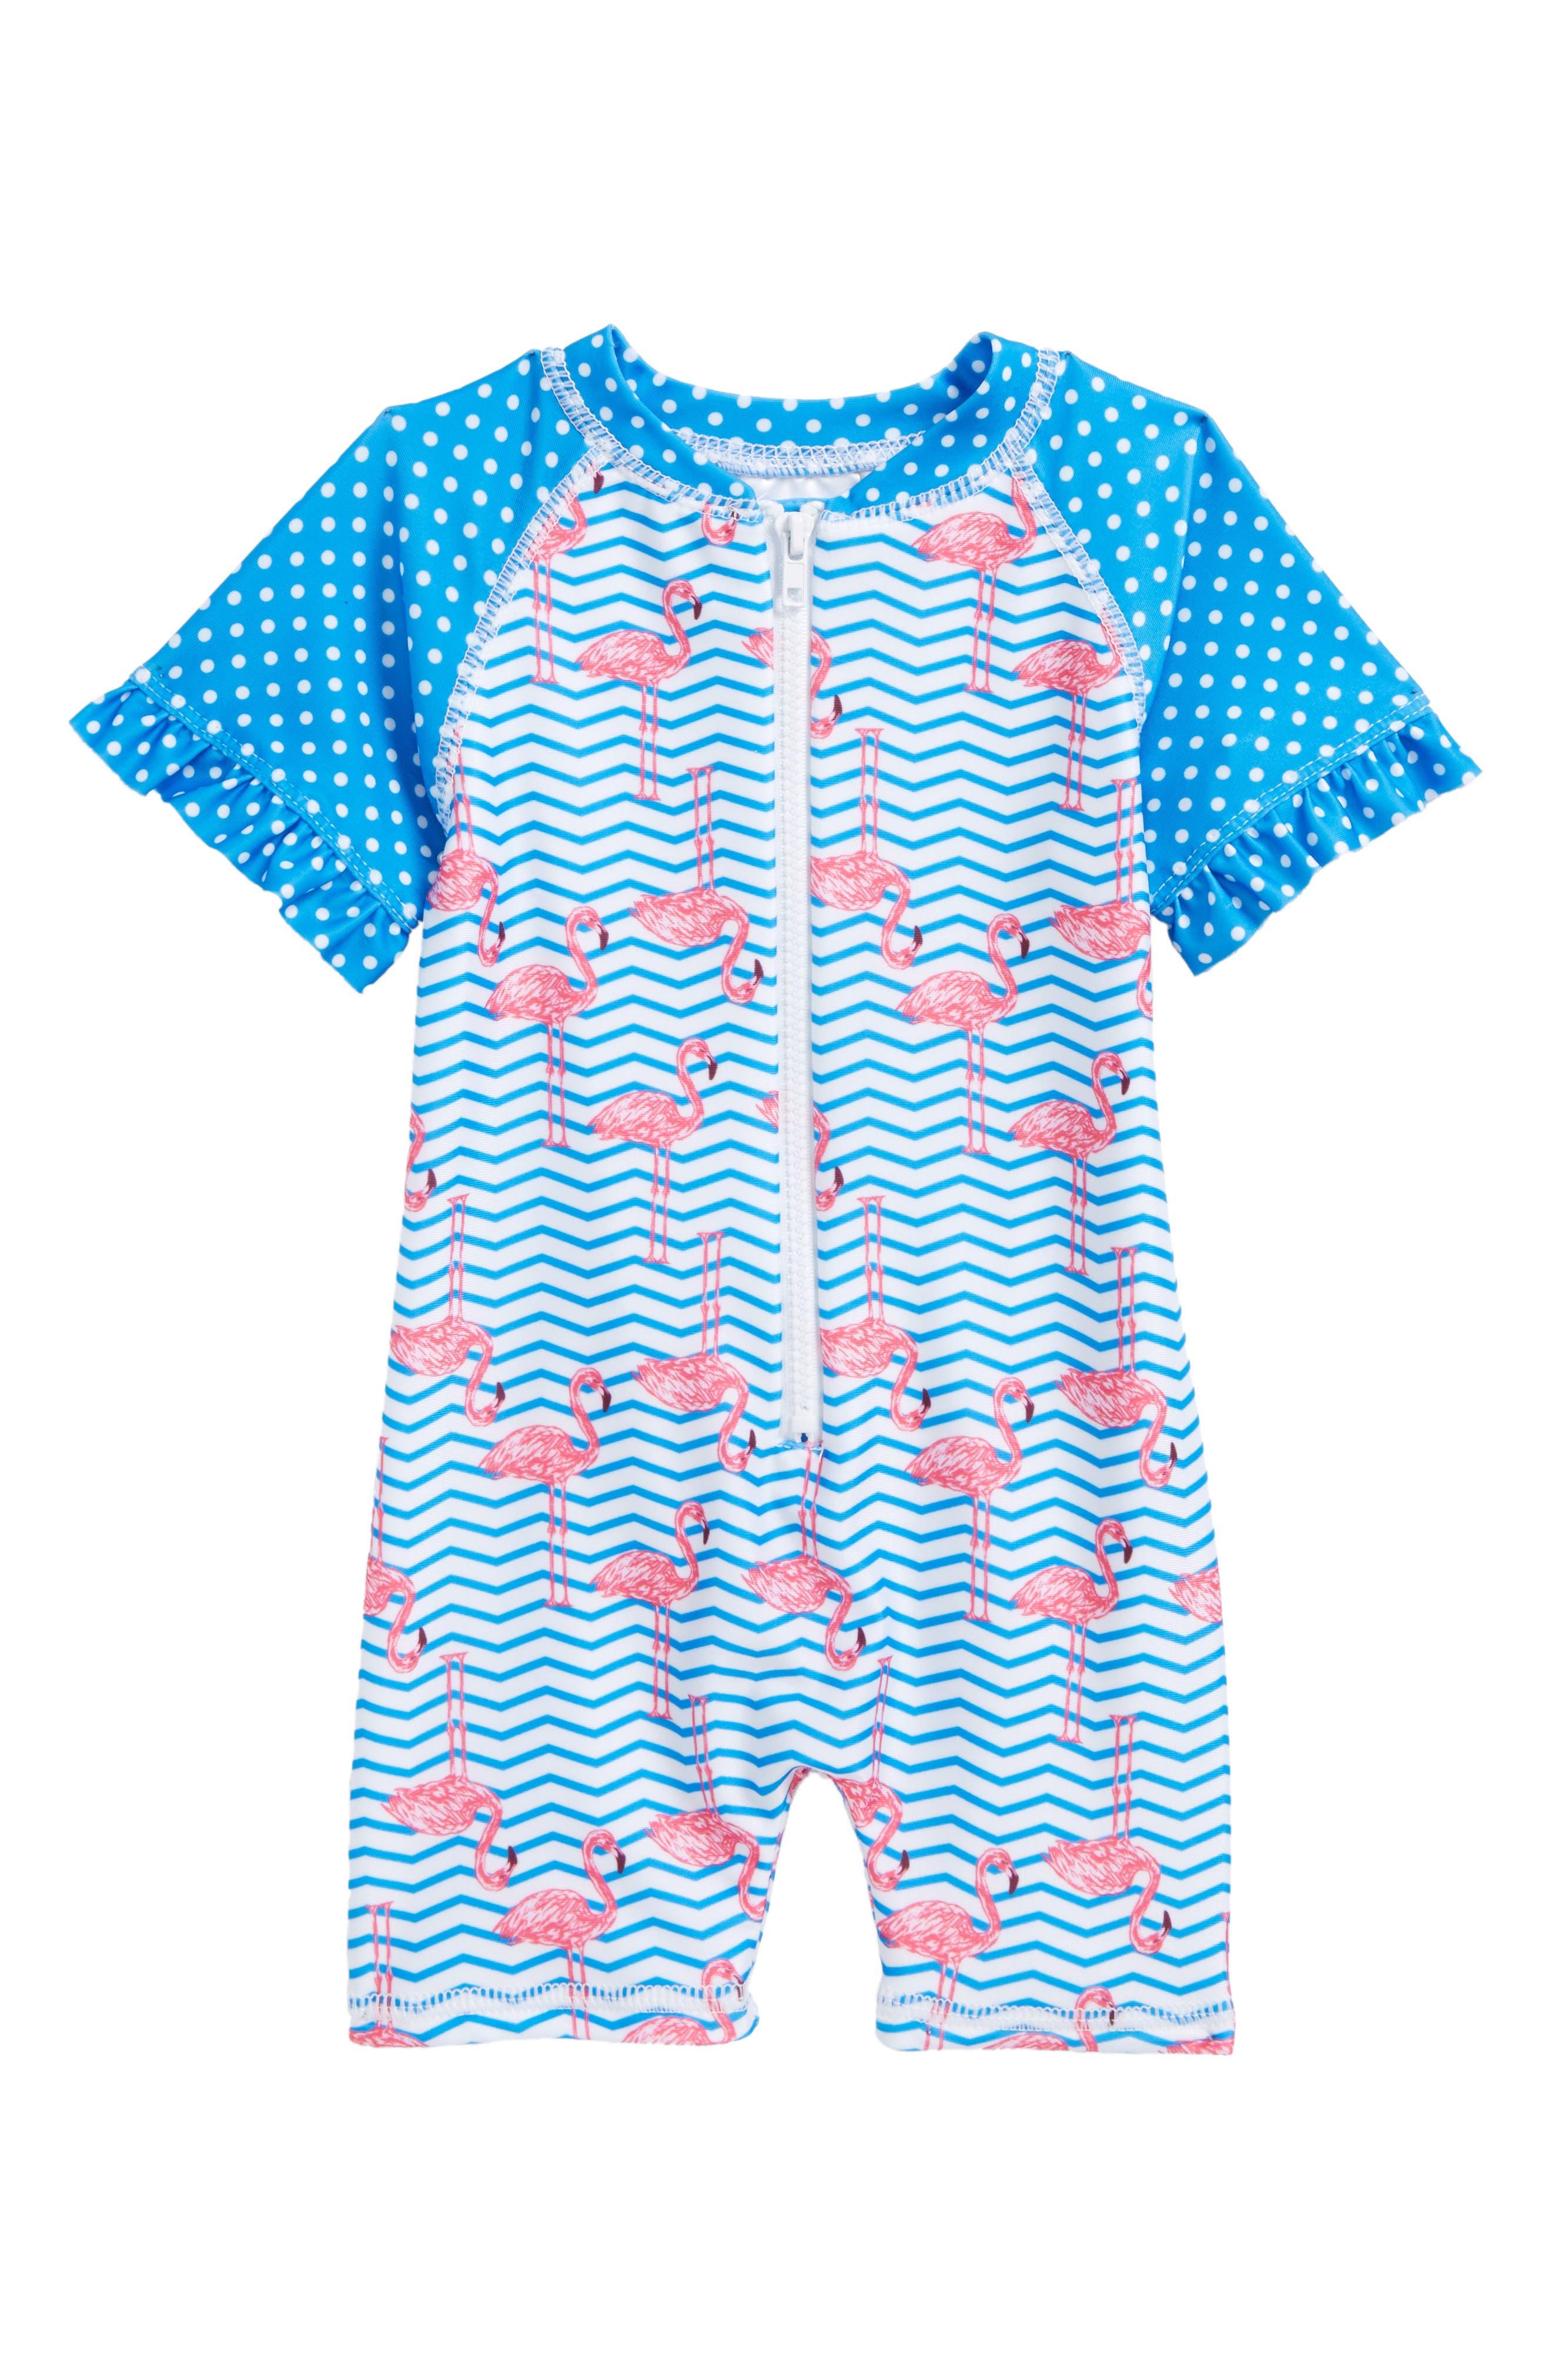 Zigzag Flamingos One-Piece Rashguard Swimsuit,                             Main thumbnail 1, color,                             439